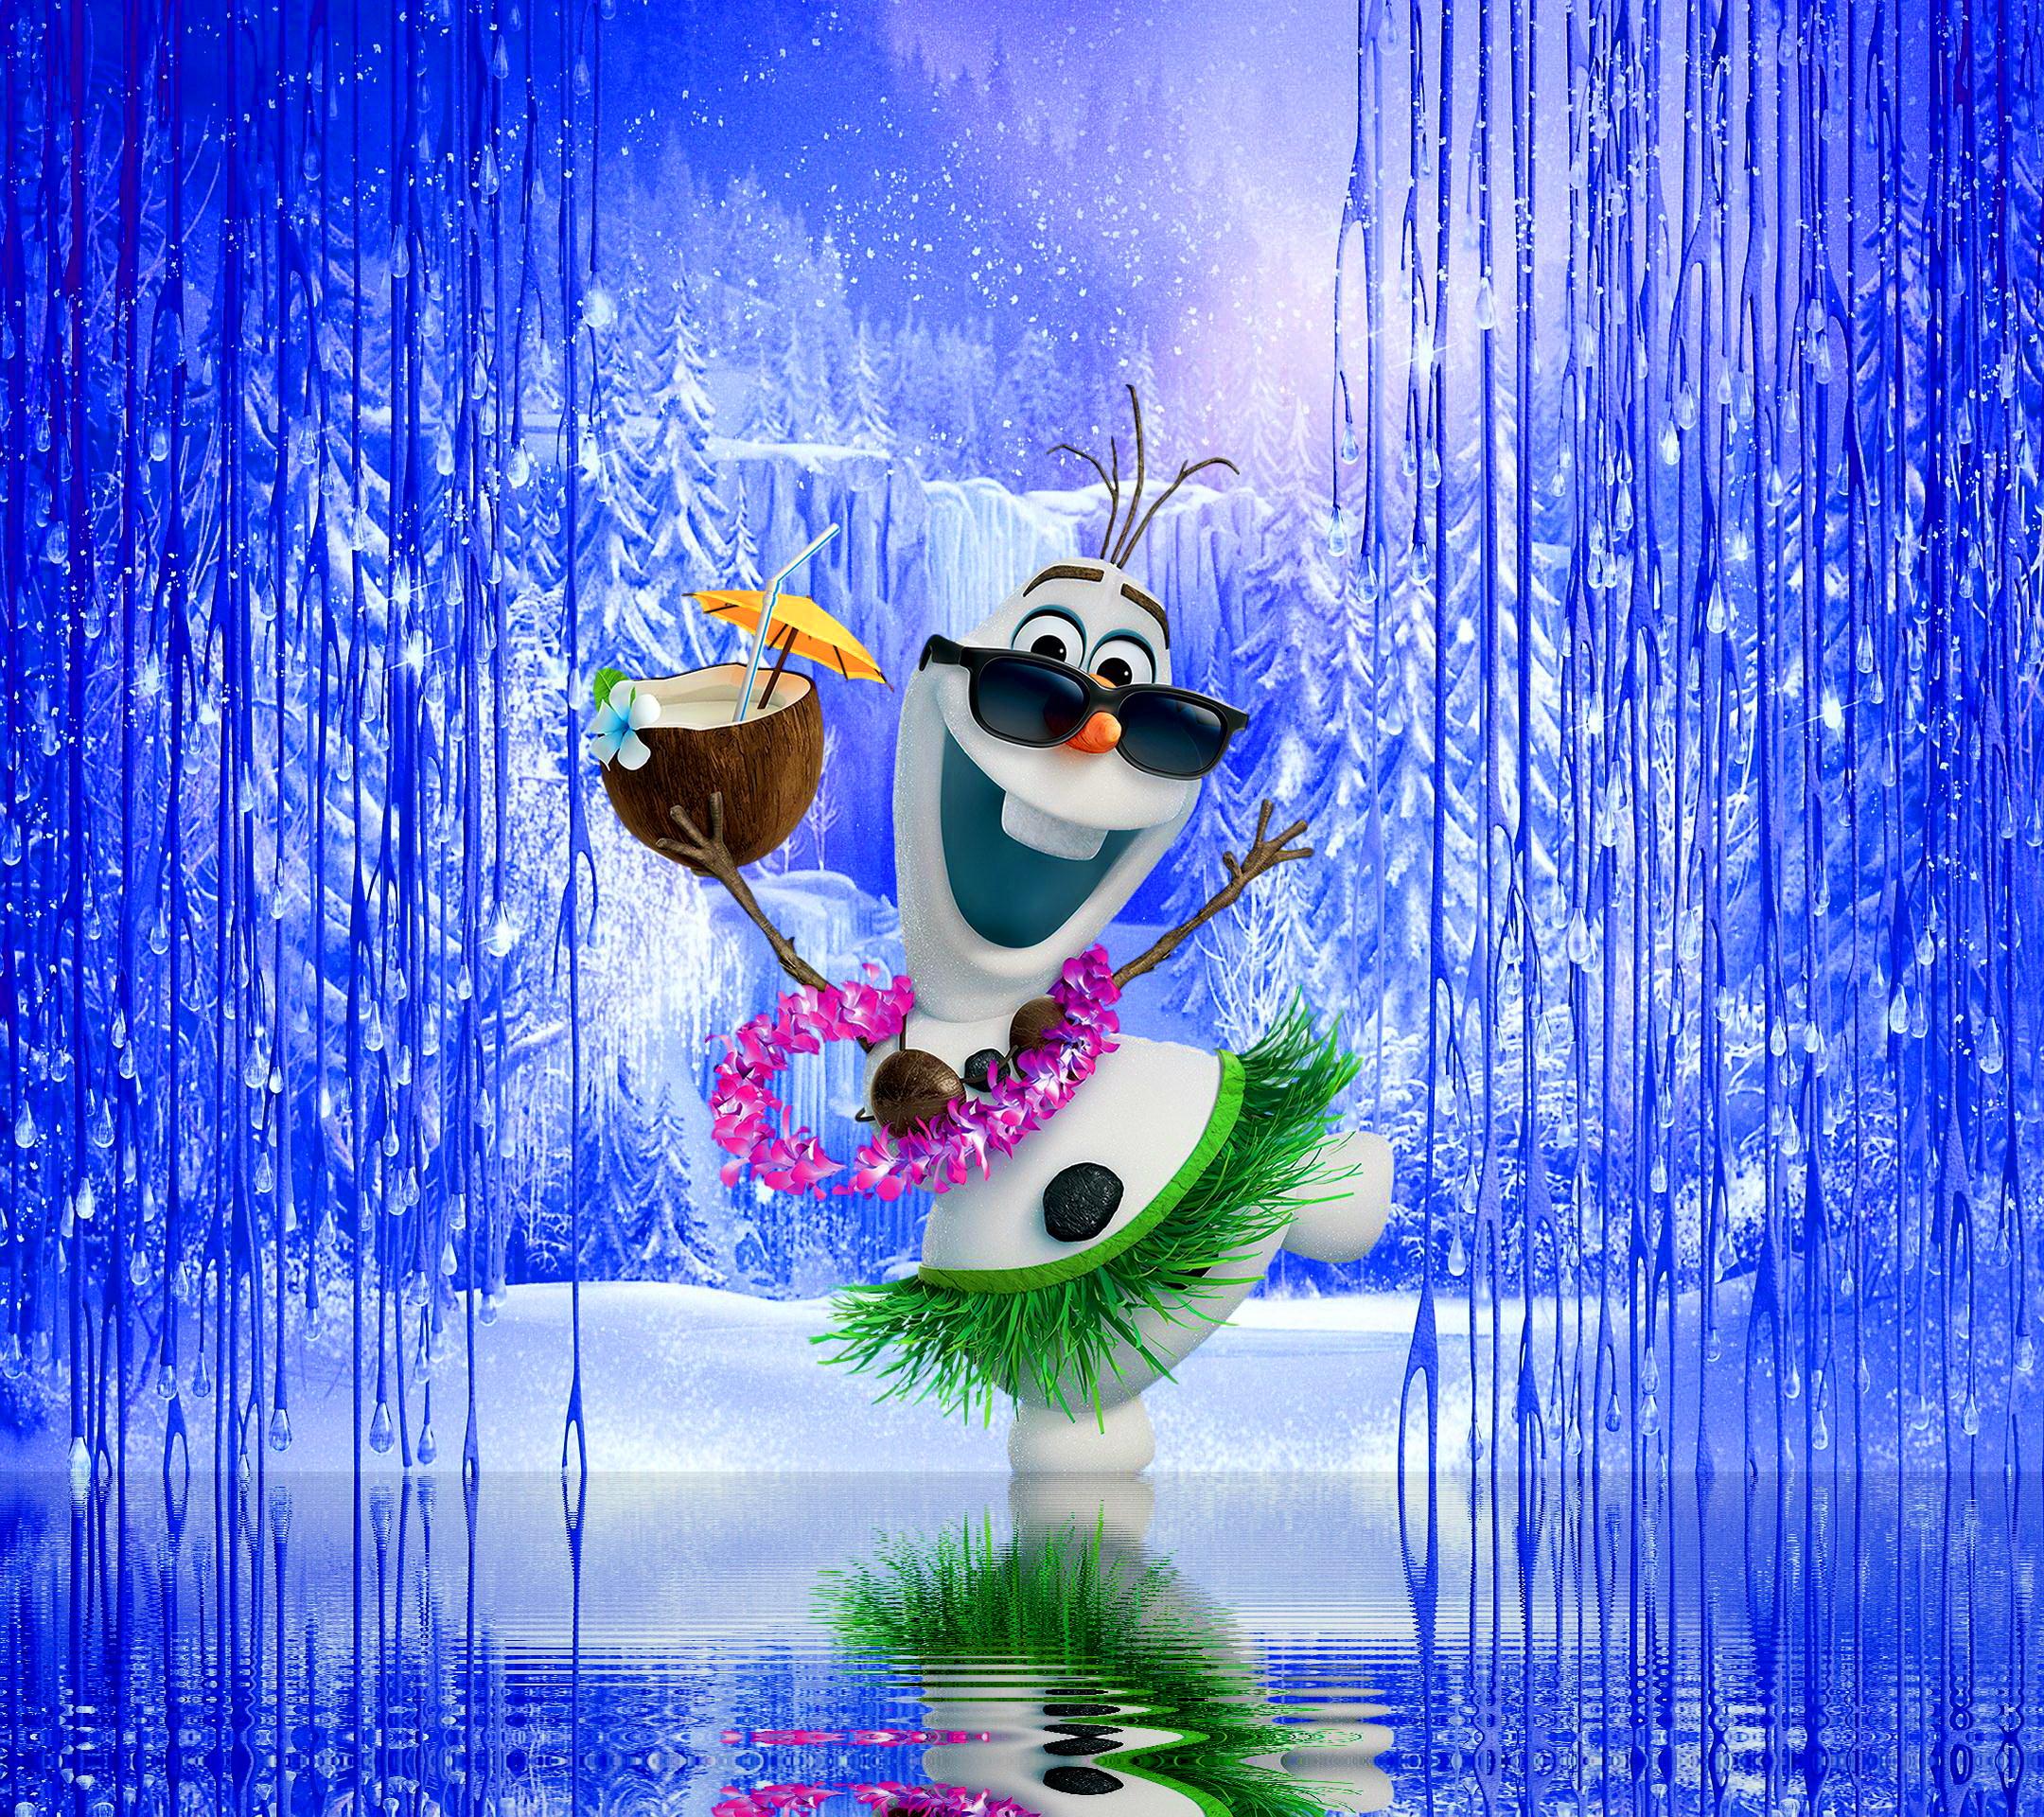 Olaf Frozen Movie Hd Wallpaper Interesting Olaf Wallpaper 2160x1920